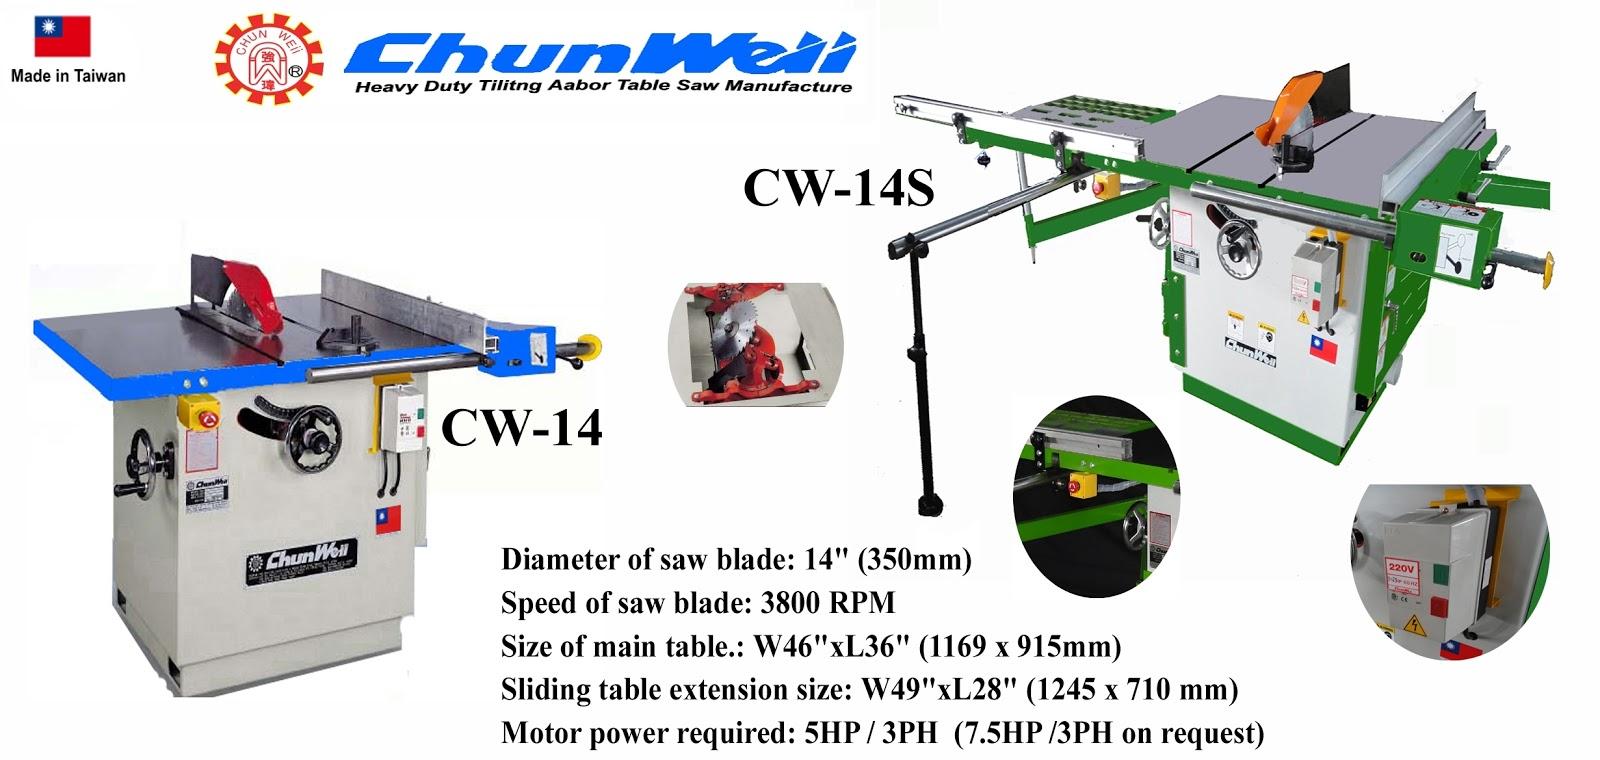 ... Table Saw From Taiwan (Woodworking Machinery ) ~CHUN WEii Machinery